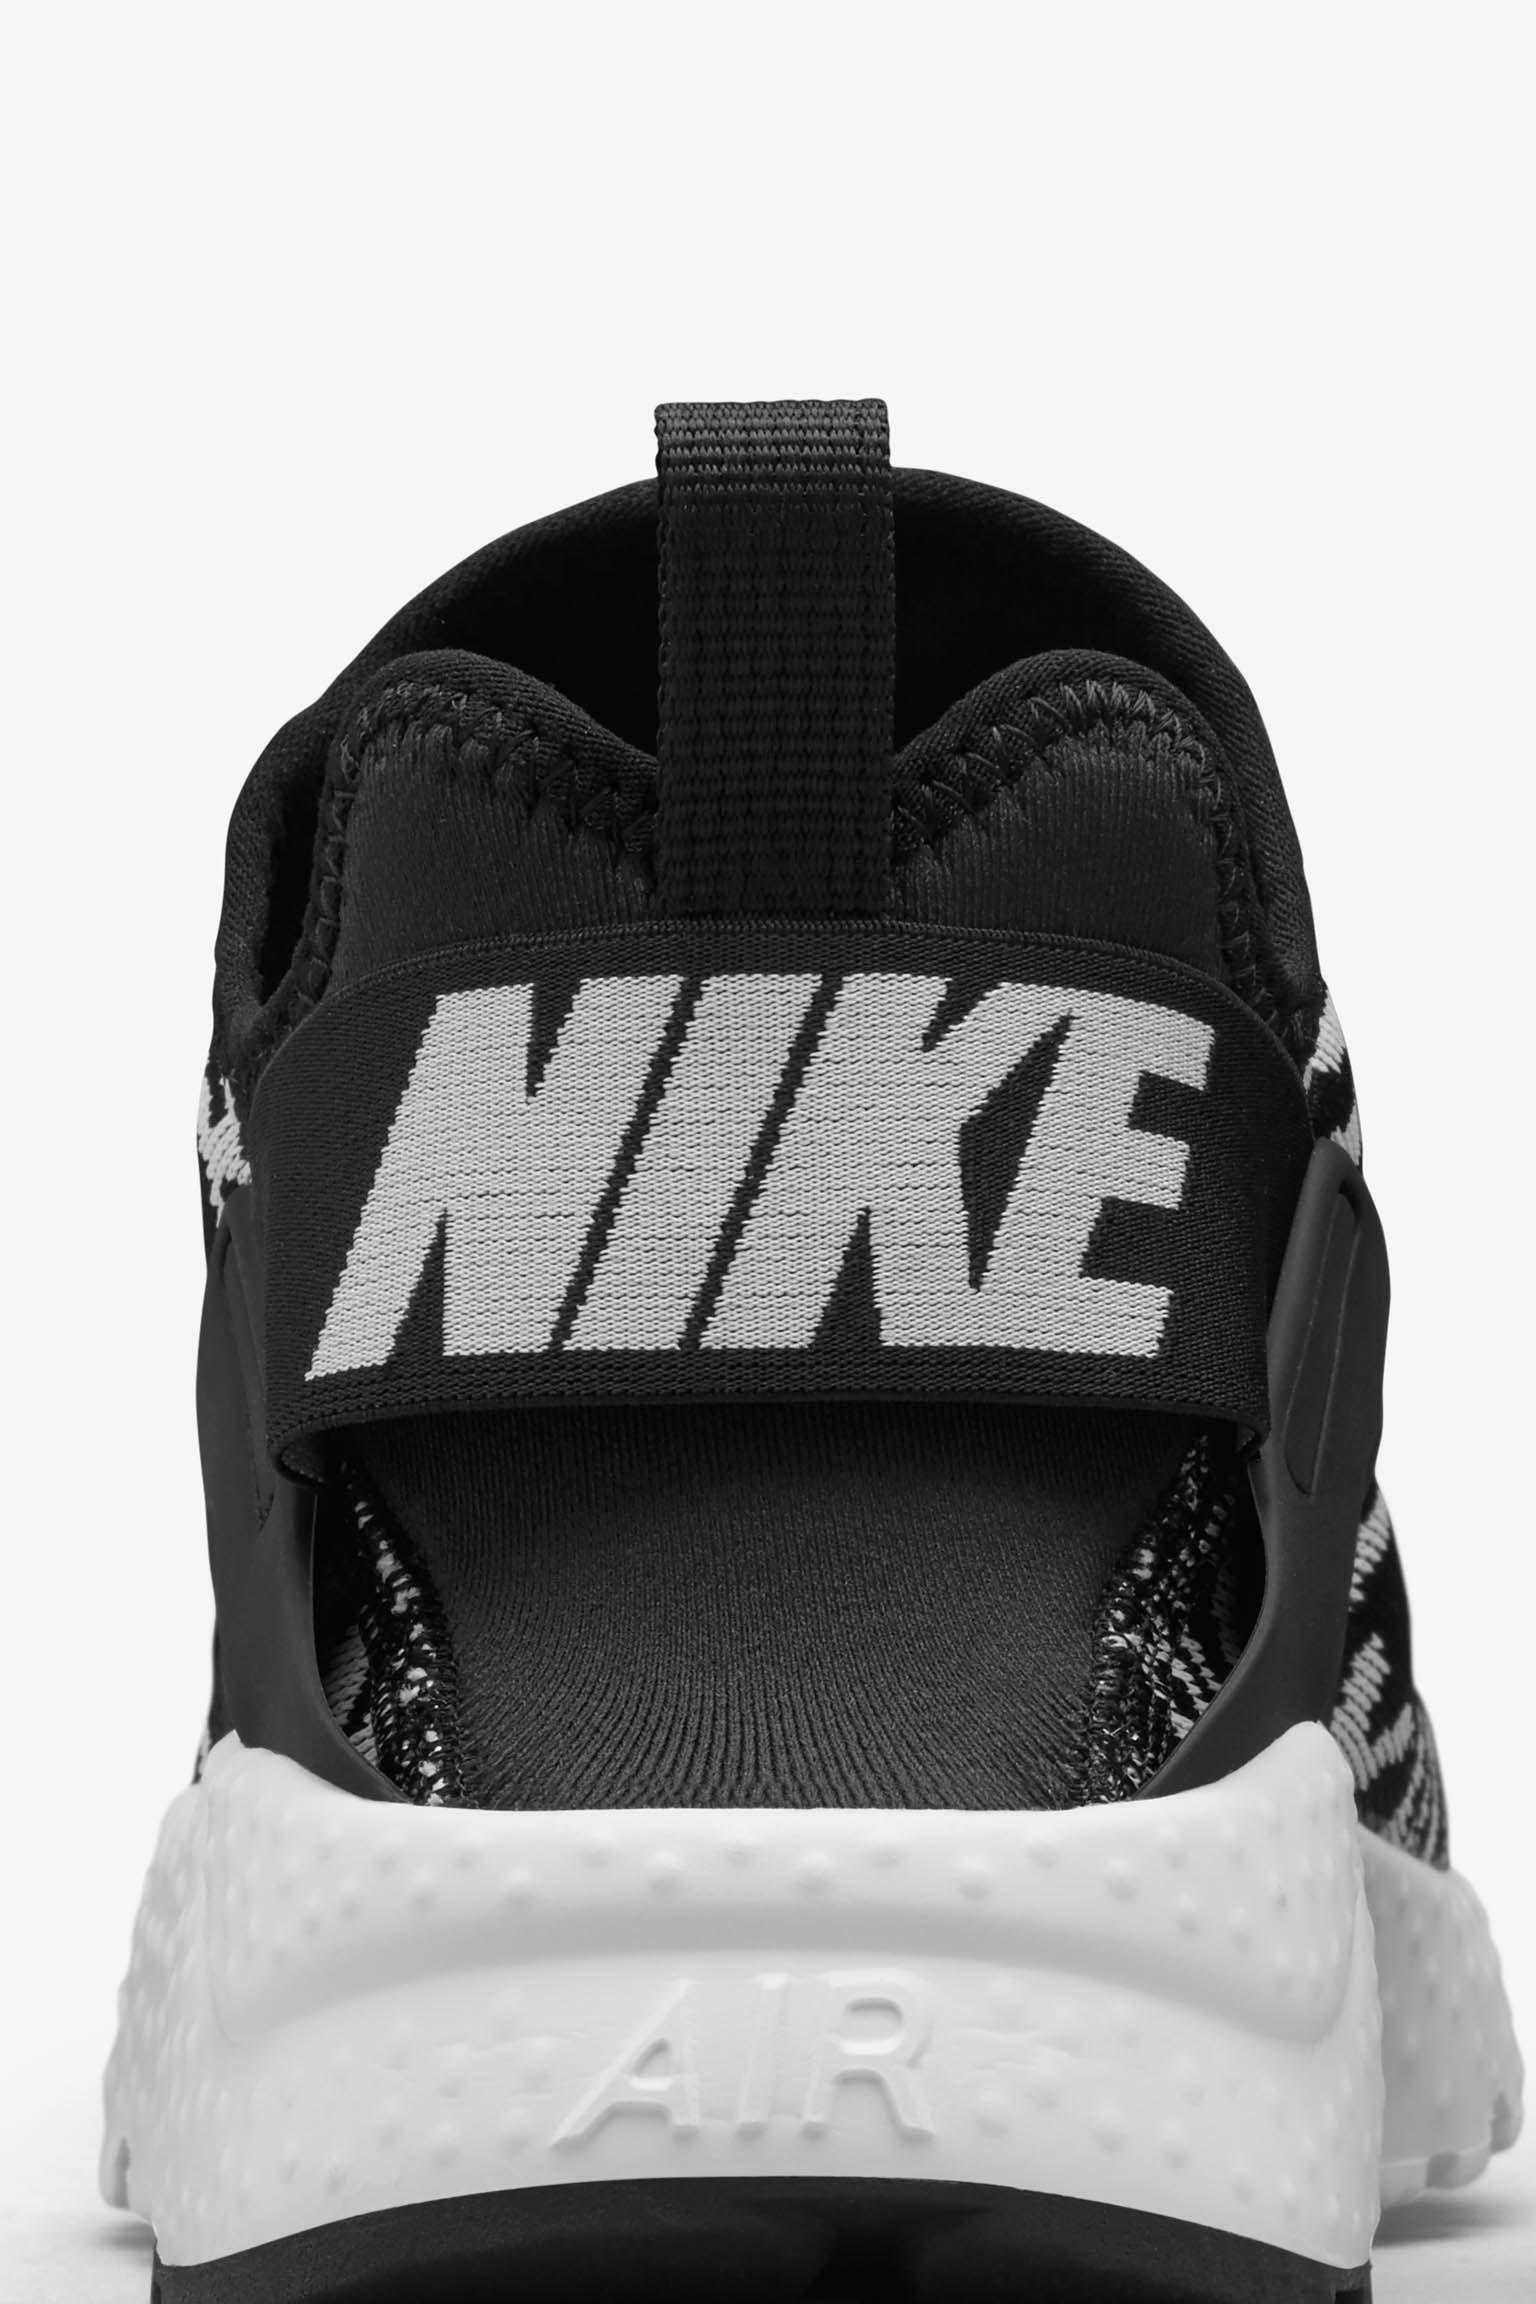 Women's Nike Air Huarache Ultra JCRD 'Metallic Silver & Wolf Grey'